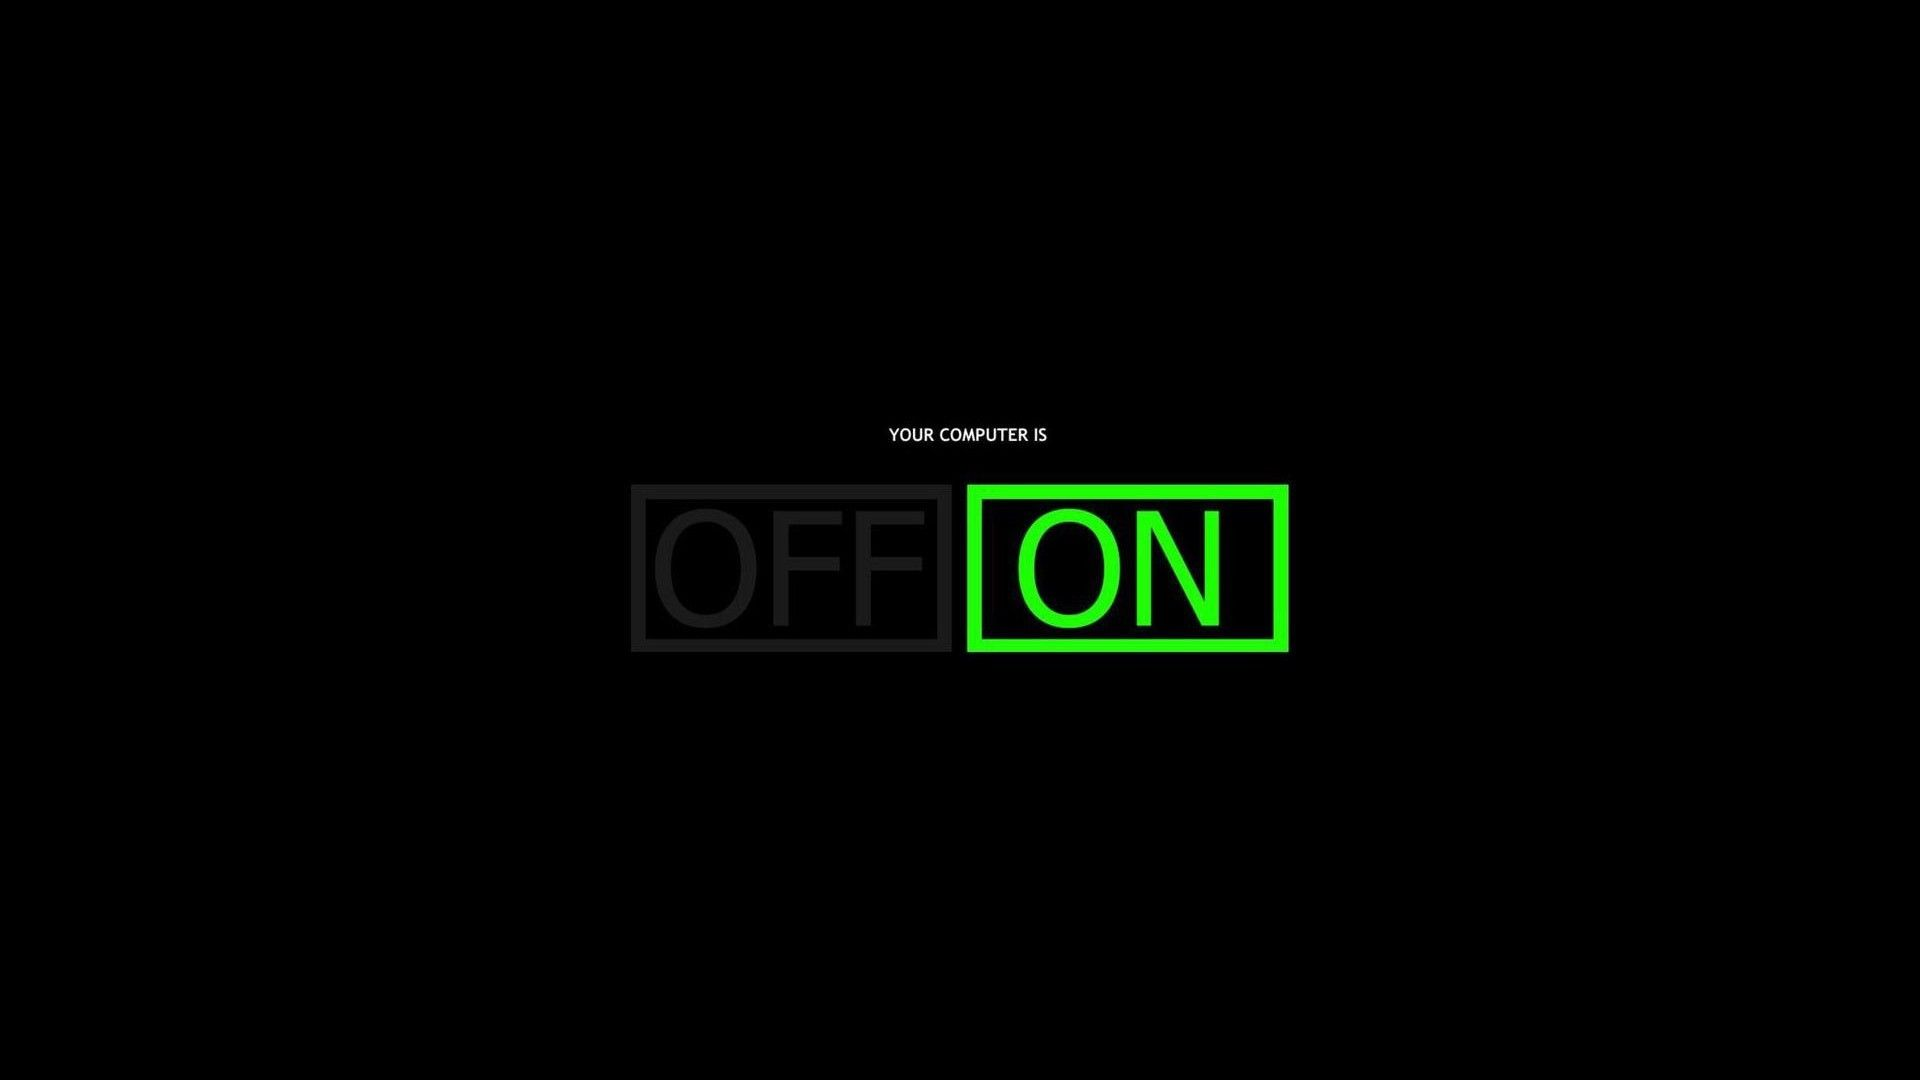 Black Typography Selective Coloring Computer Dark Green